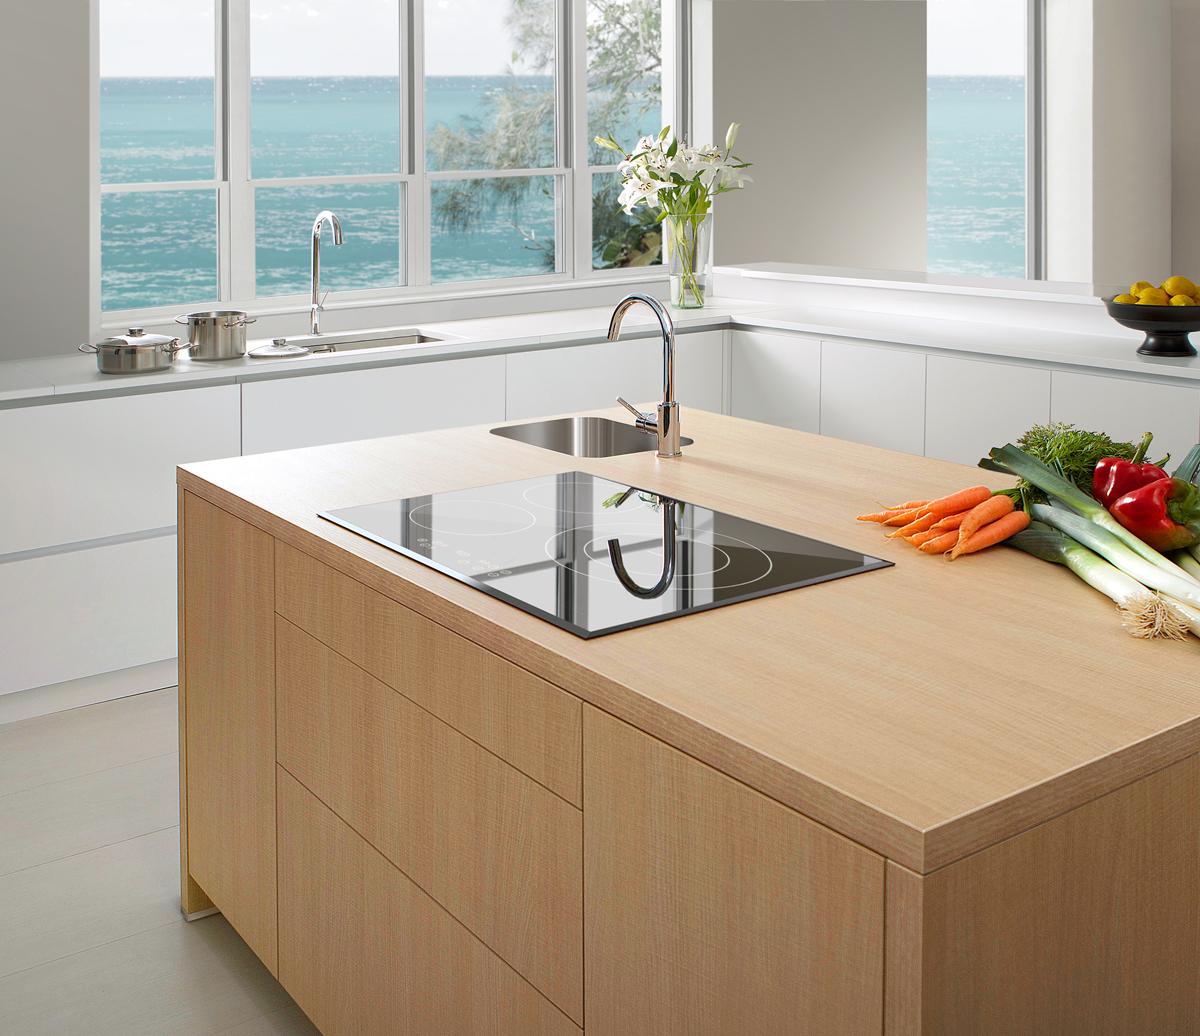 Geo quattro rh cocinas creativas f brica de cocinas for Fabrica de cocinas integrales